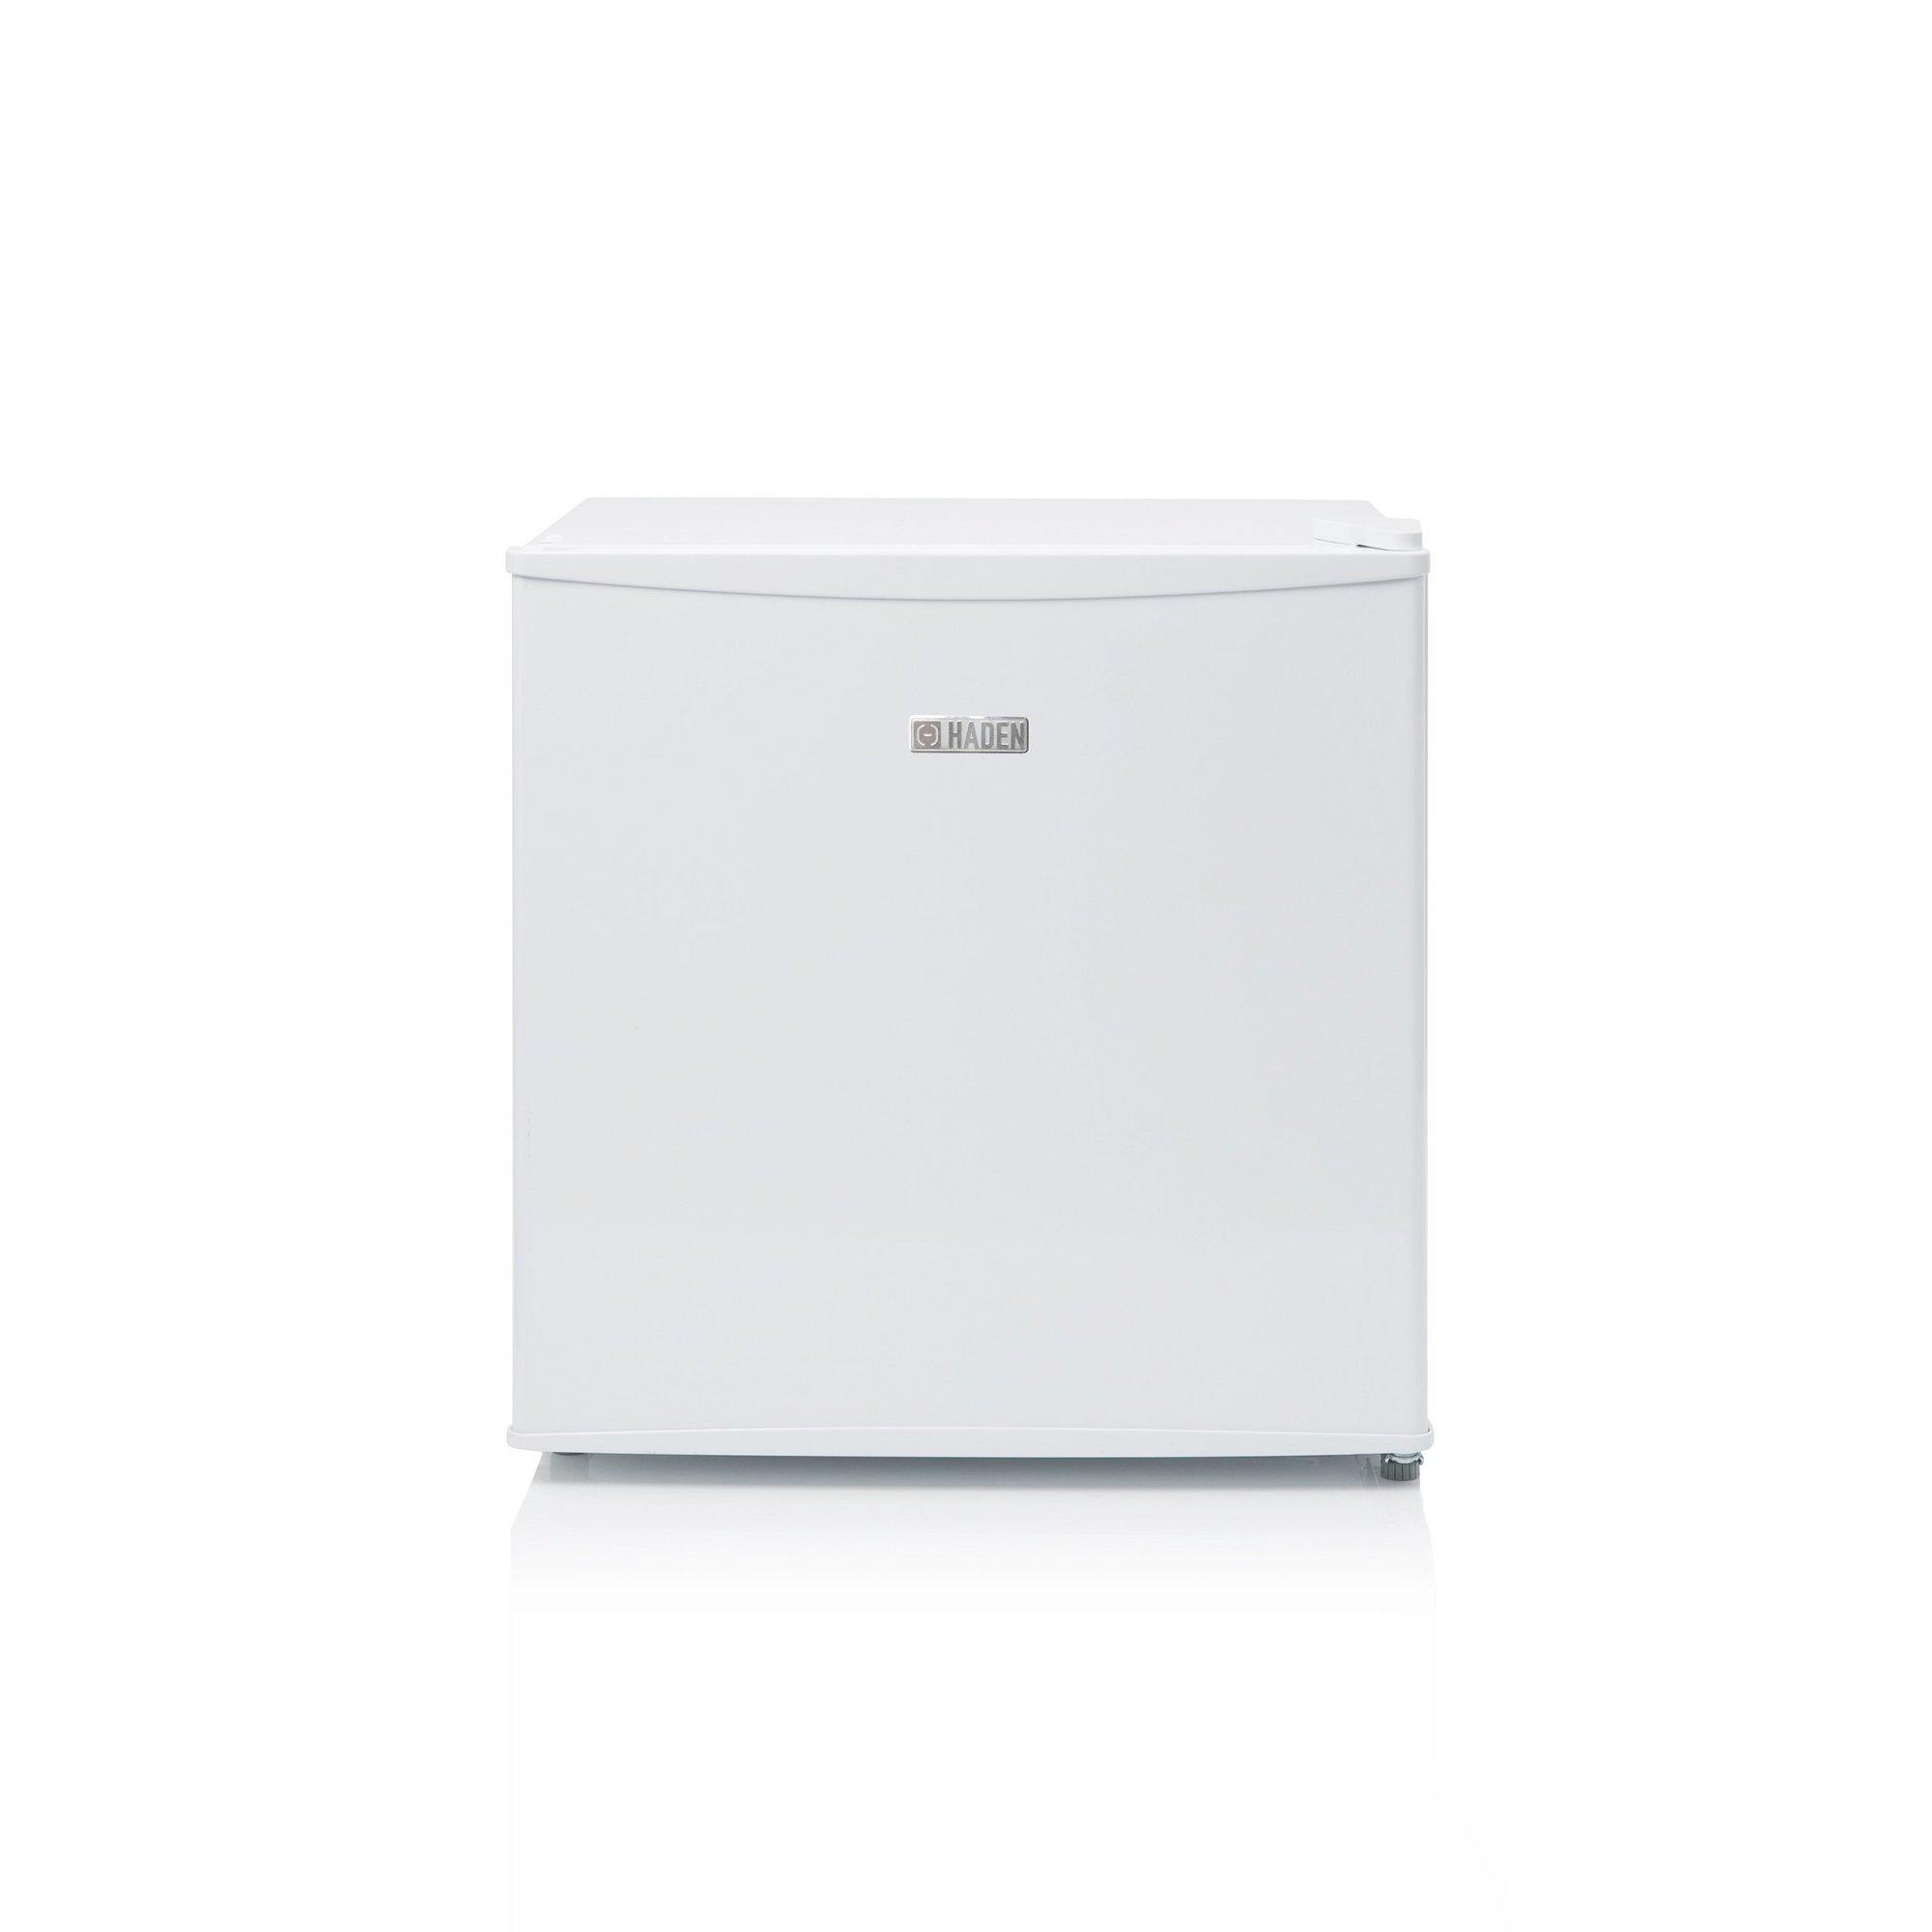 Image of Haden 47cm Table Top Compact Freezer